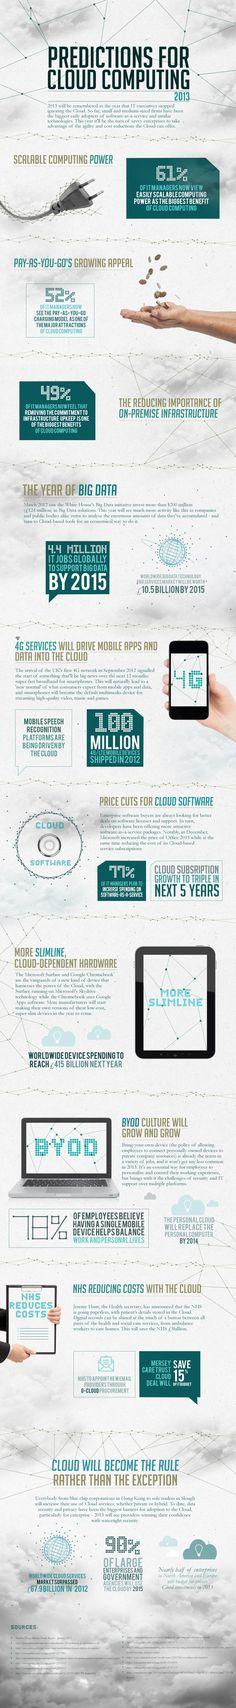 Predictions for cloud computing 2013